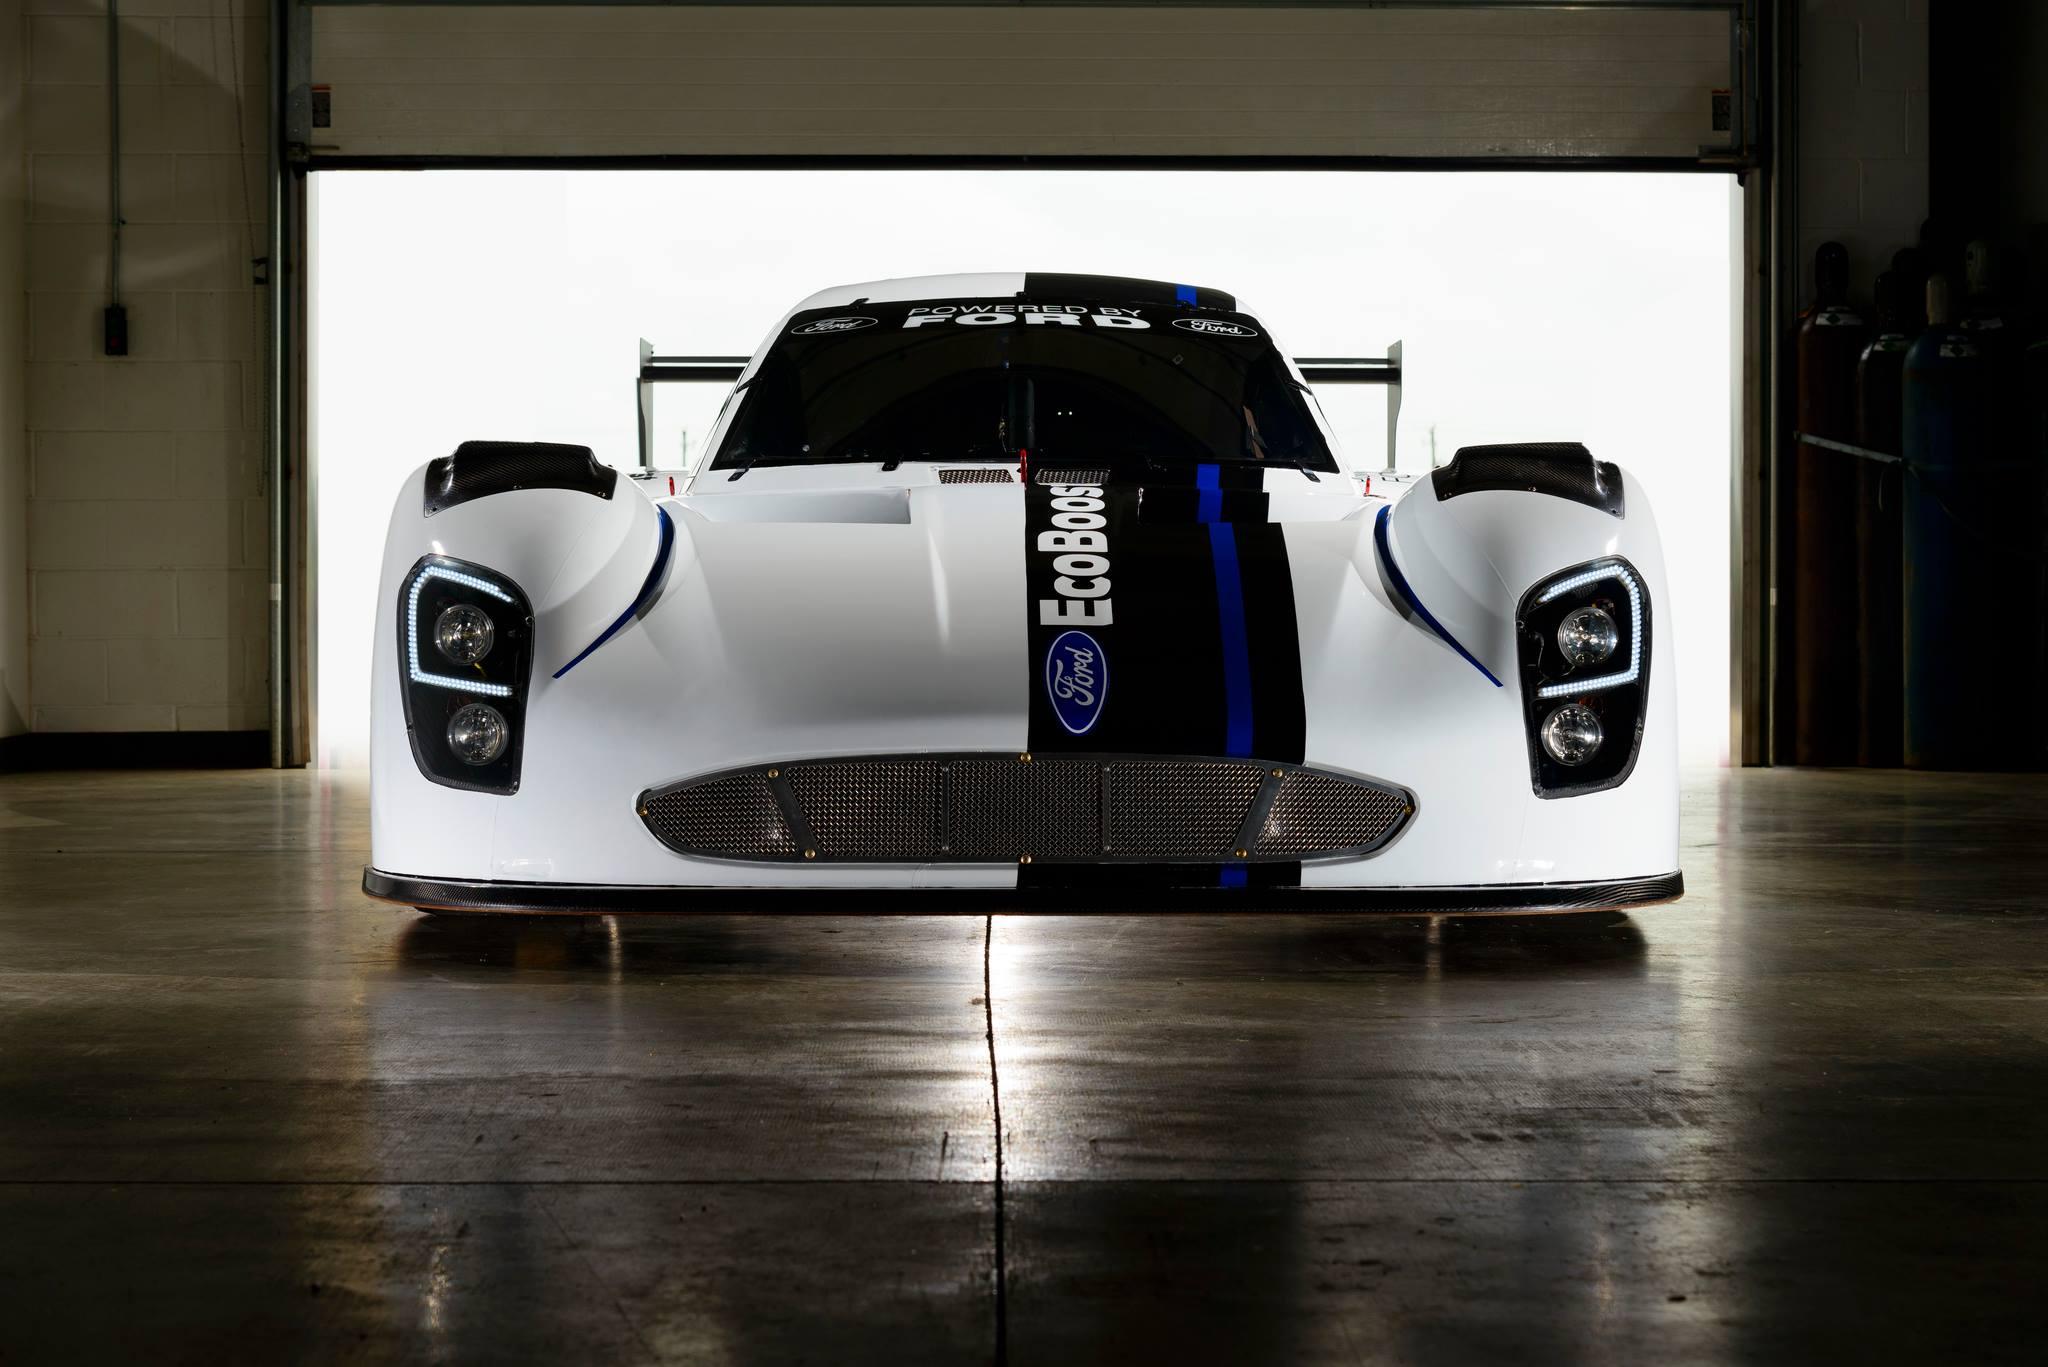 EcoBoost Daytona Prototype, Mercedes AMG GT, $52 Million Ferrari: This Week's Top Photos